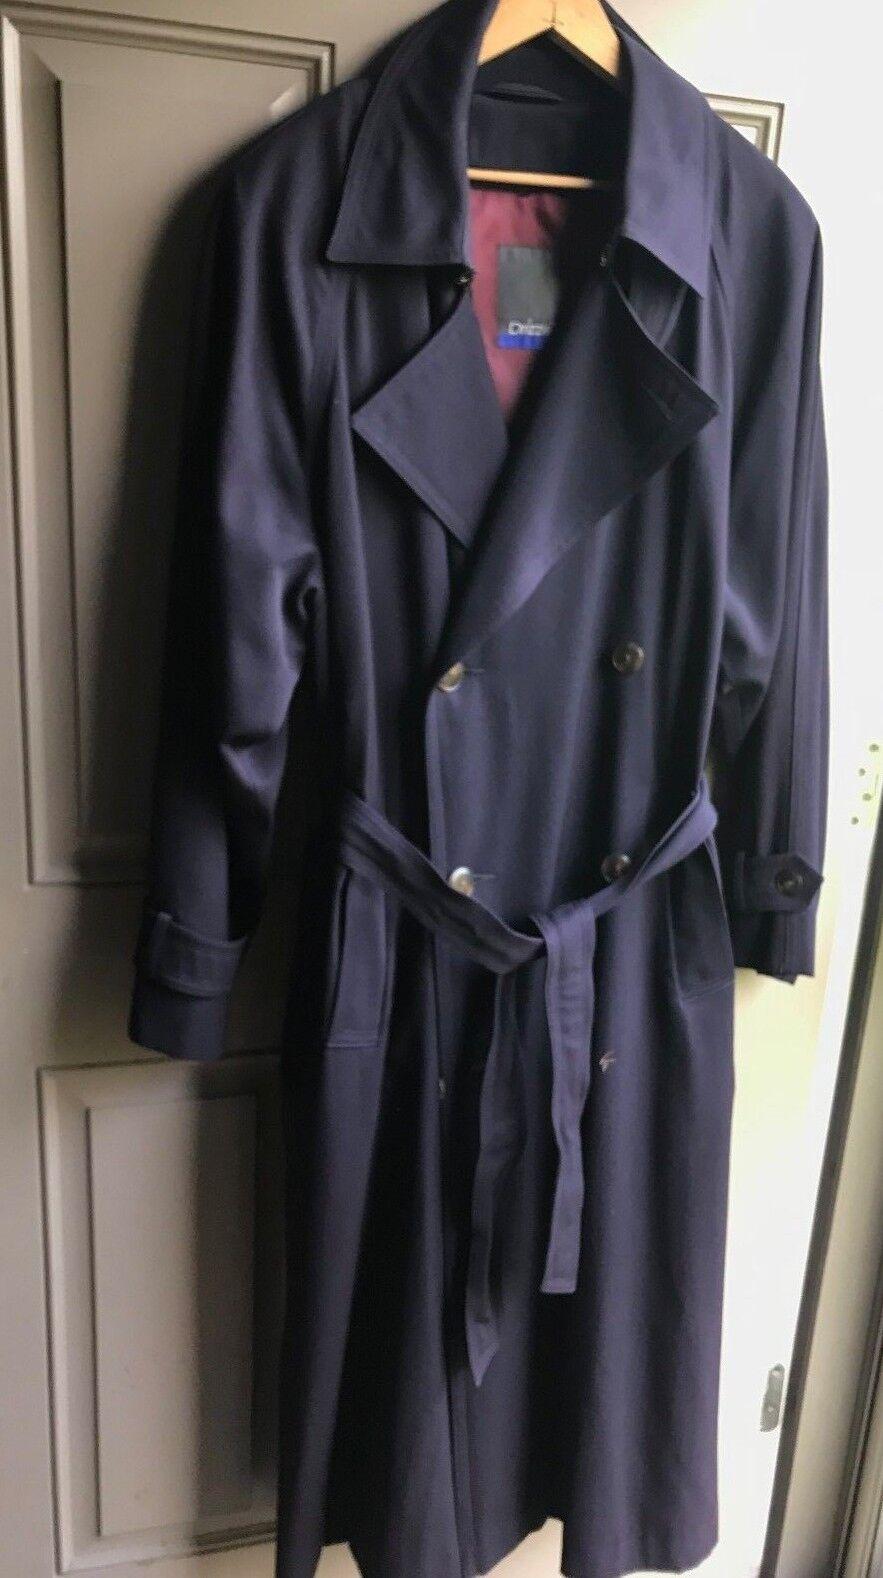 Bloomingdale's Drizzle Military BlauTrench Rain Coat Men's 36 Regular Lined